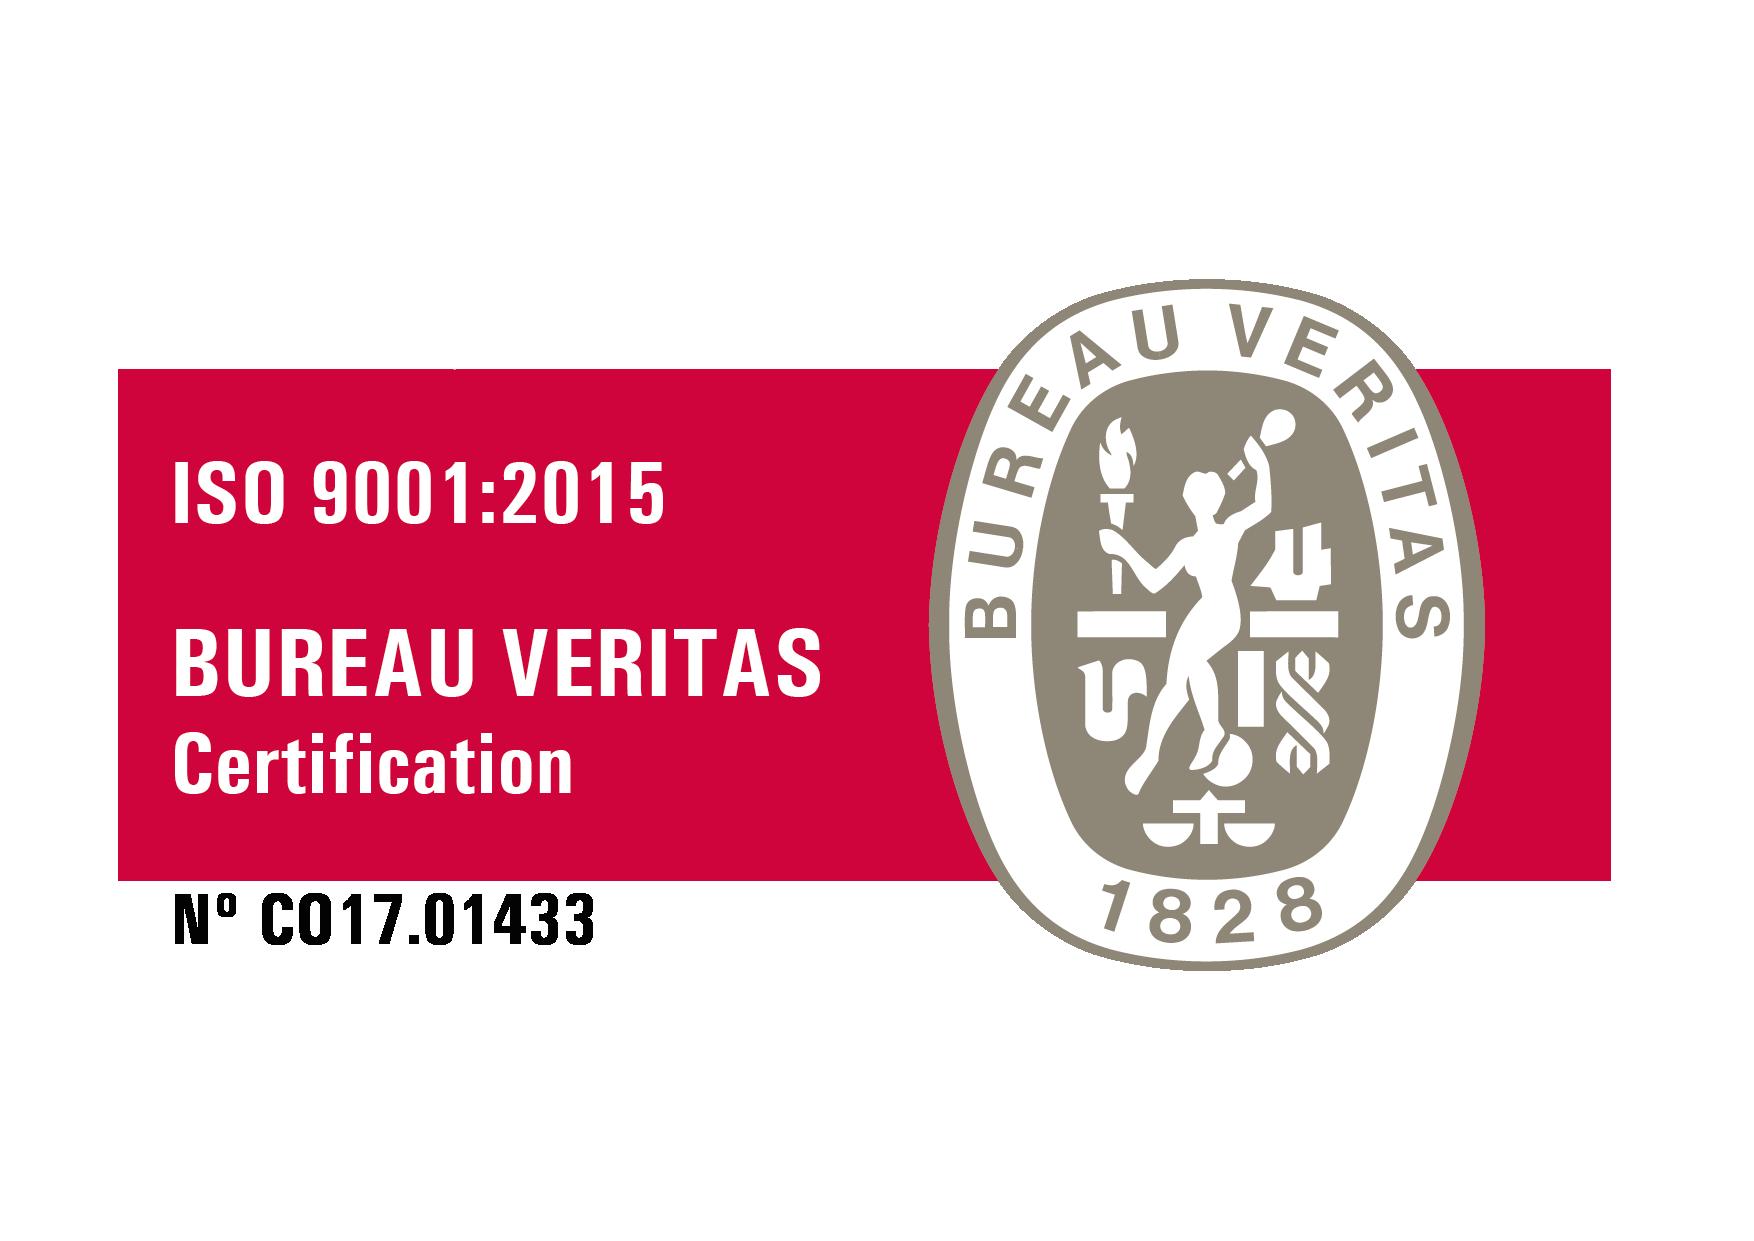 BV_Cert_ISO9001-2015 NUEVO-01